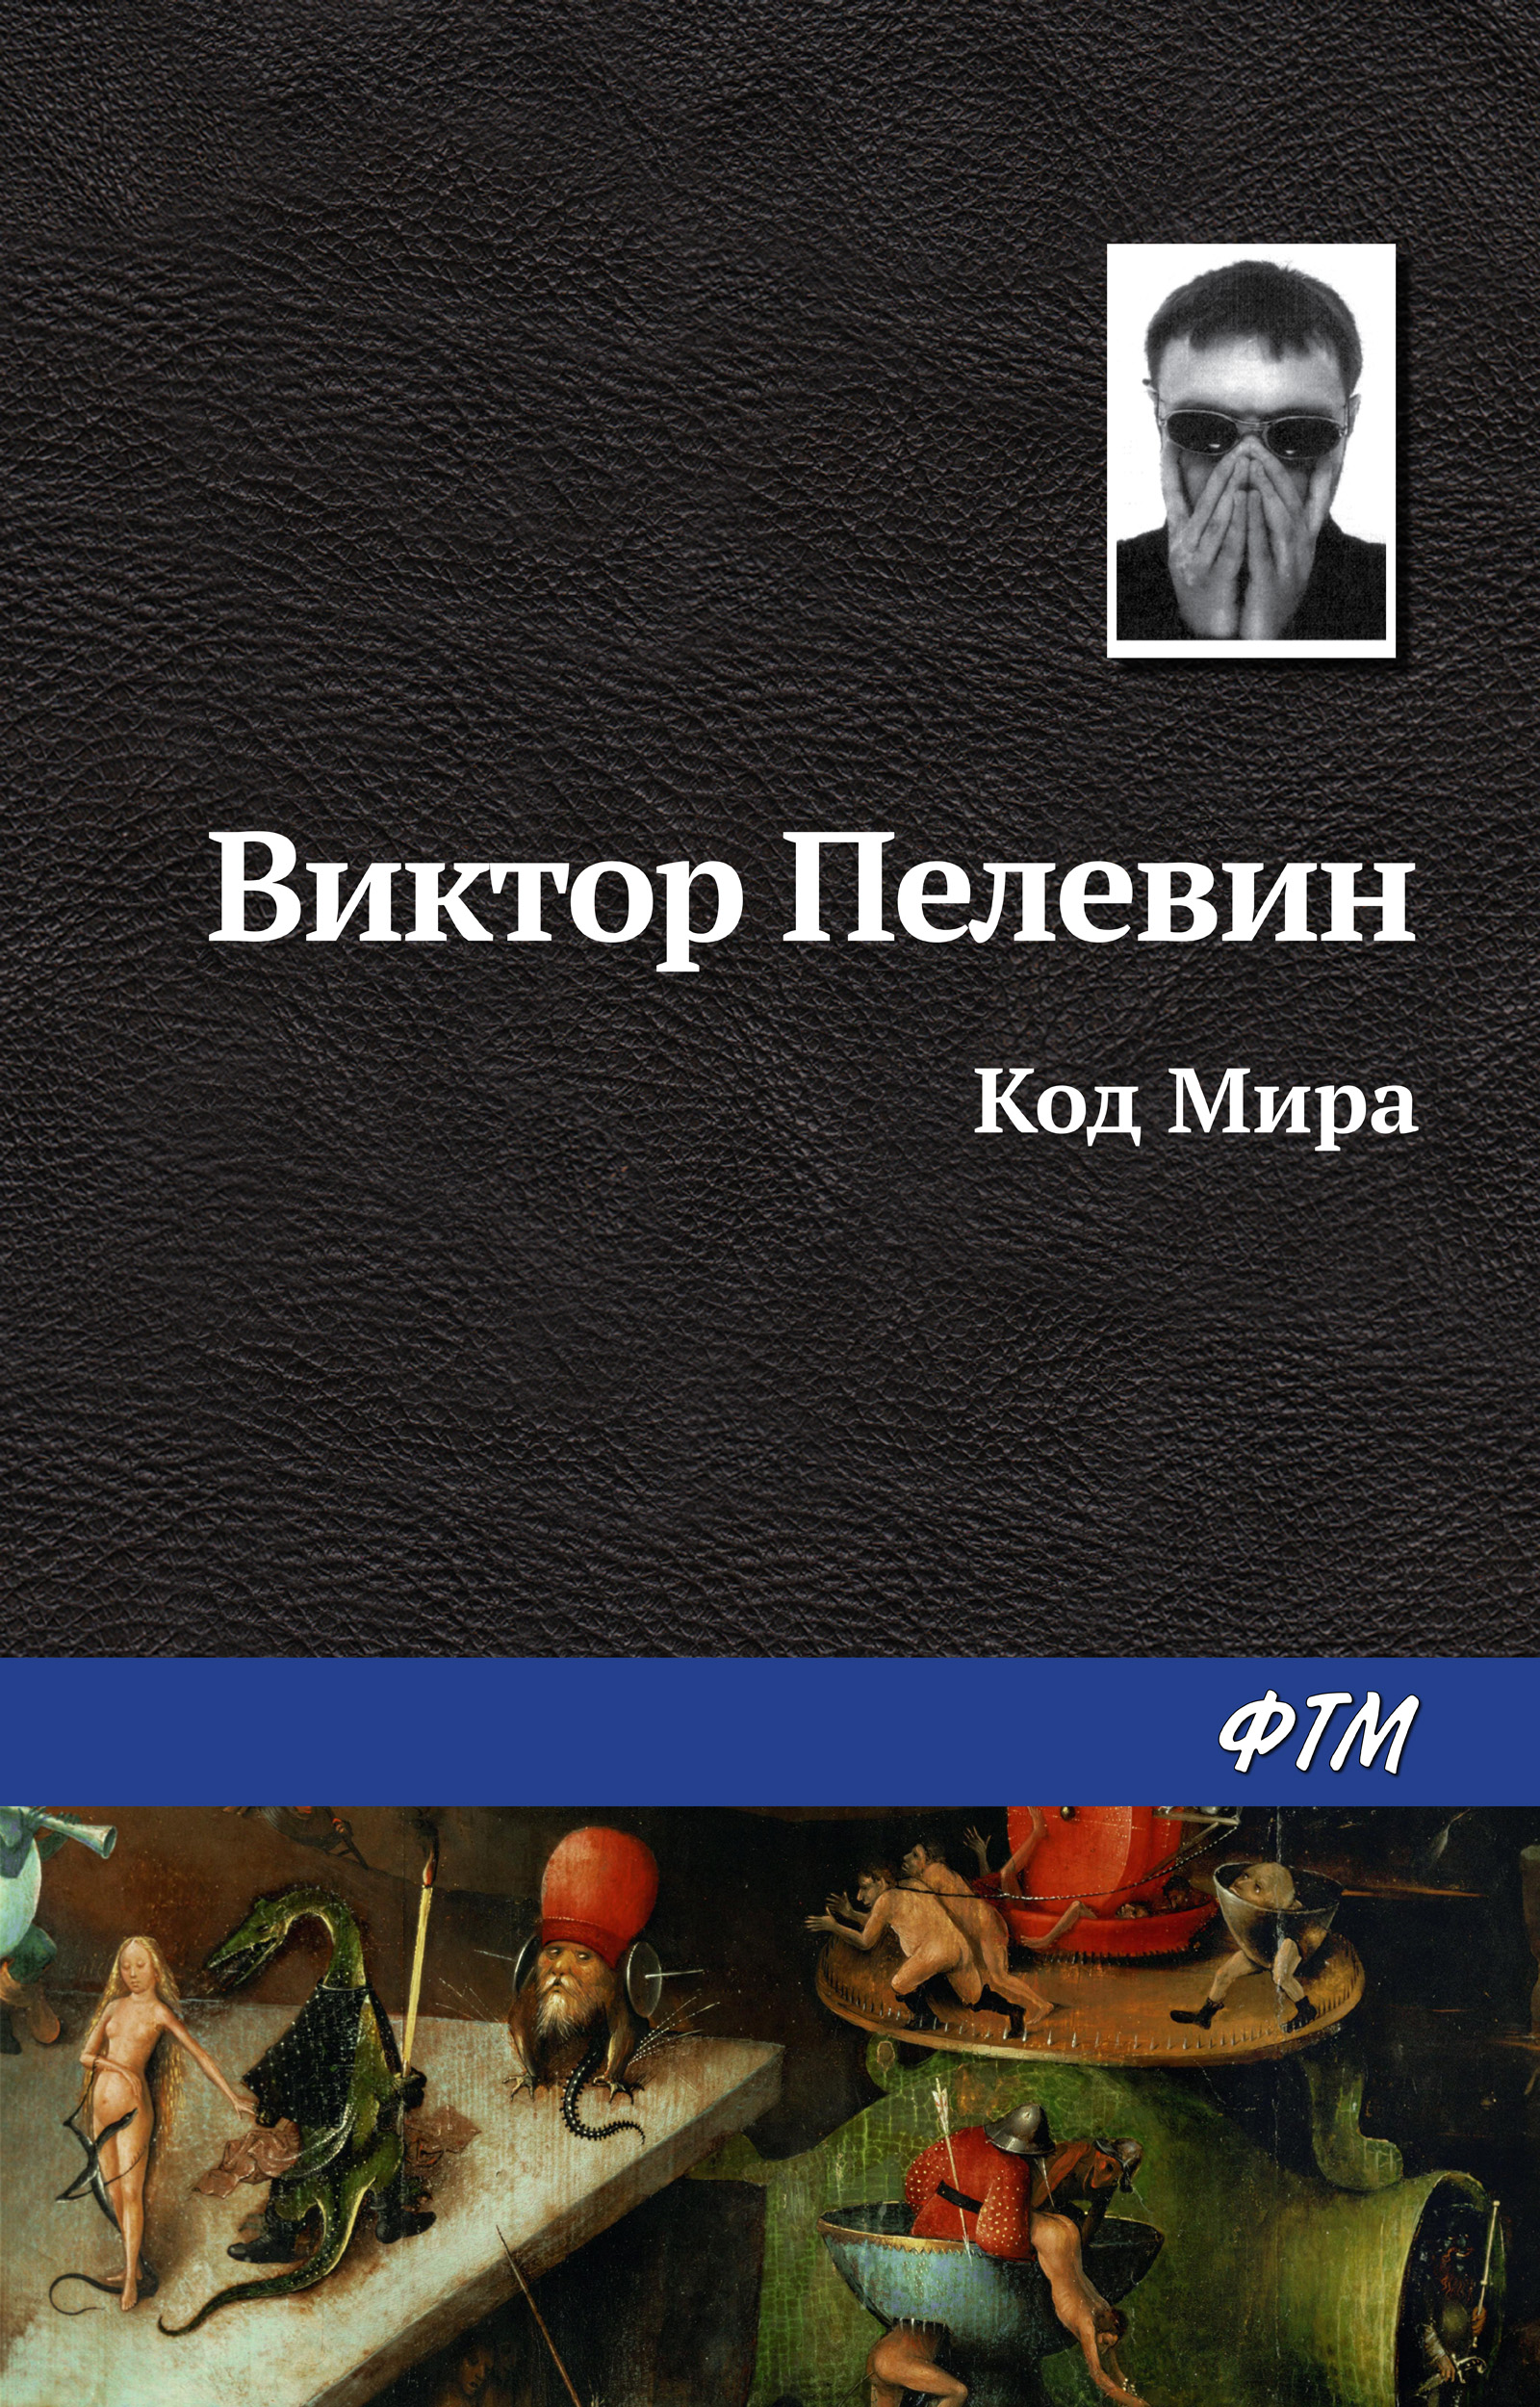 Виктор Пелевин Код Мира виктор пелевин икстлан – петушки